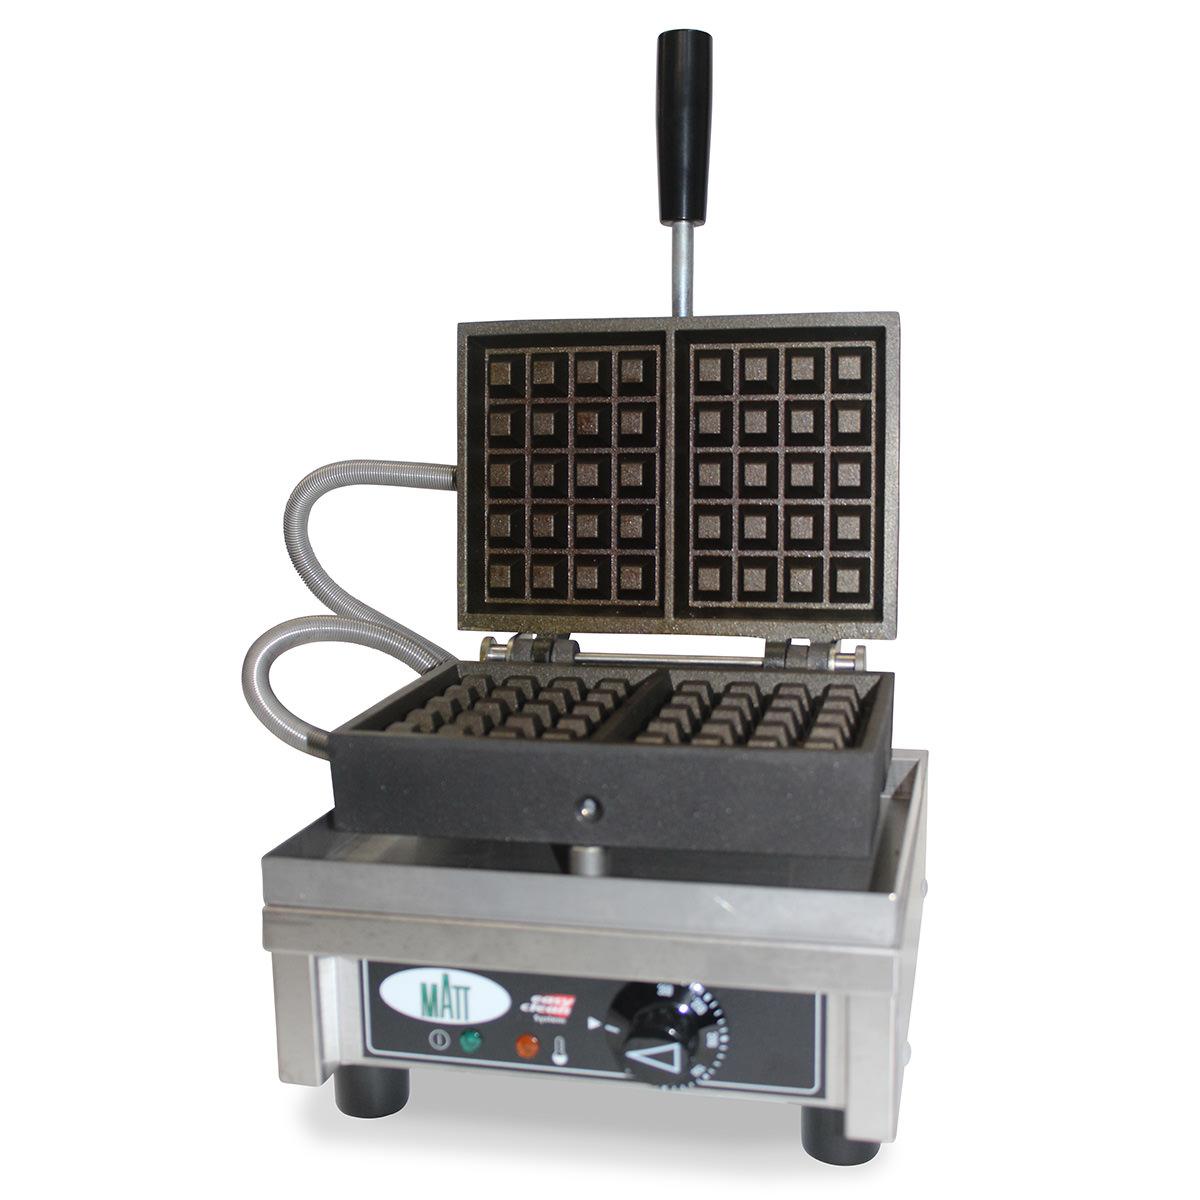 Matt Luikse wafel opwarmijzer 4x5